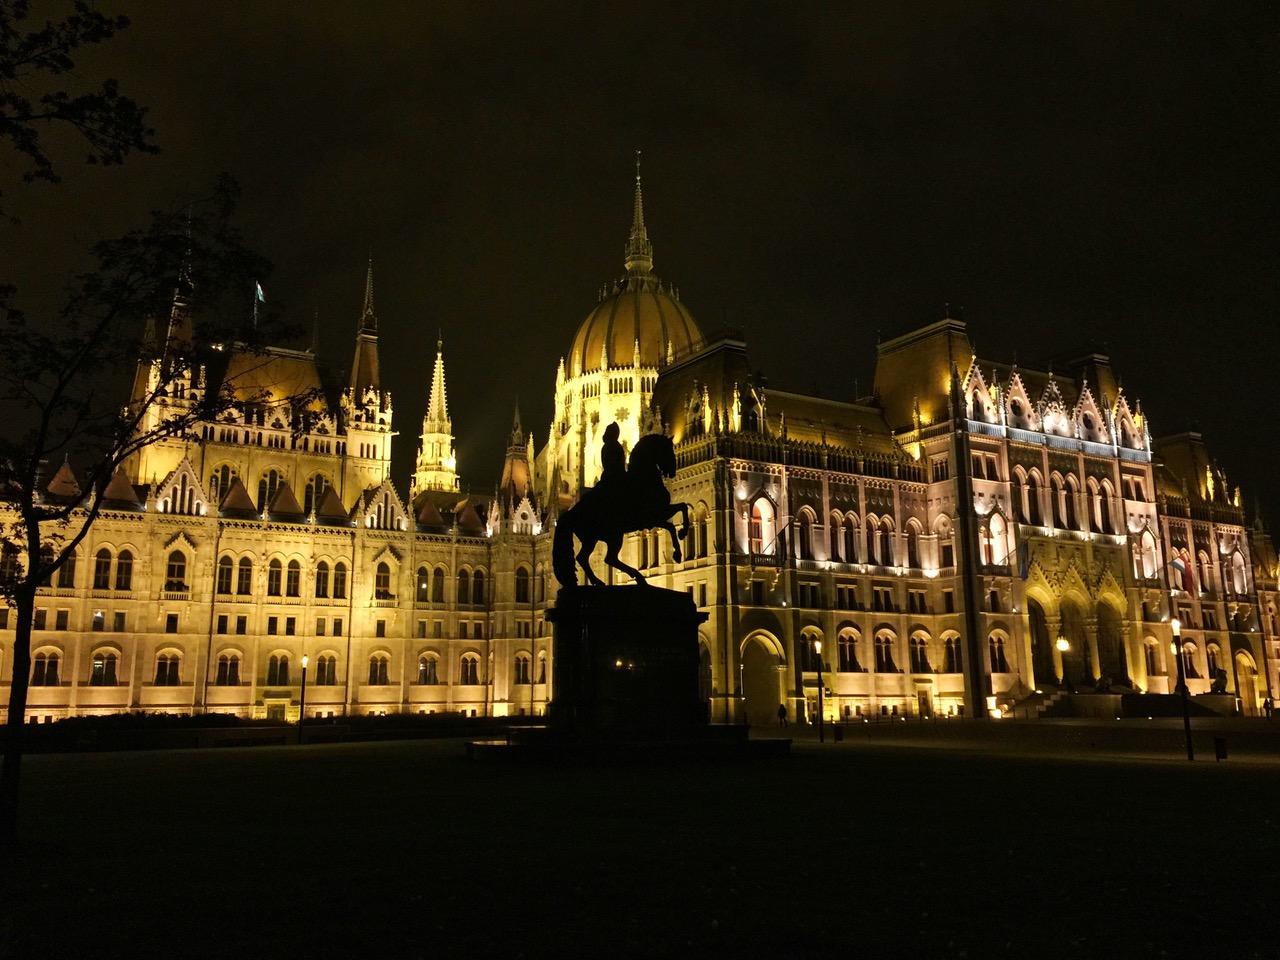 Budapest Parliament at night, Budapest, Hungary